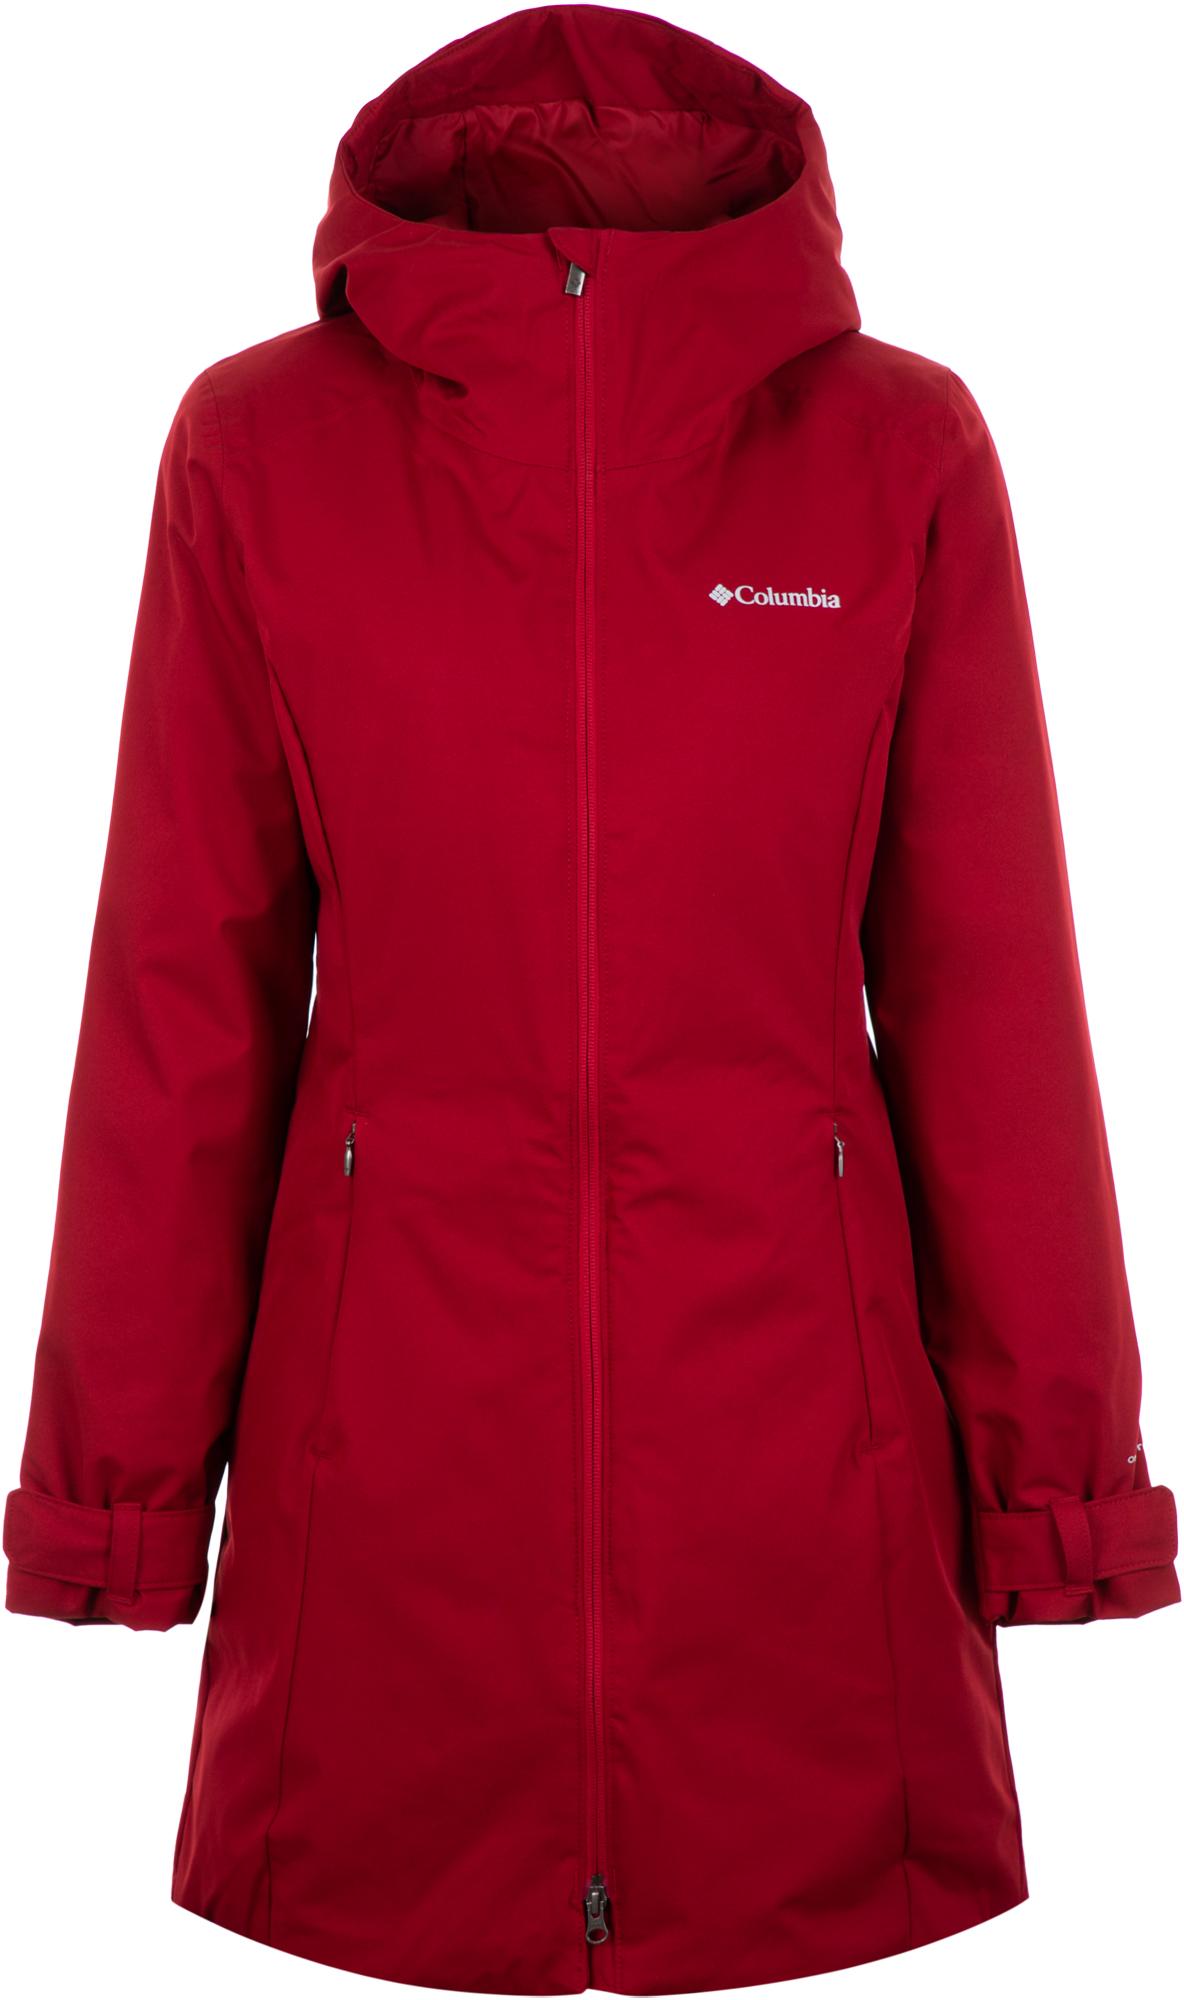 Columbia Куртка утепленная женская Autumn Rise, размер 50